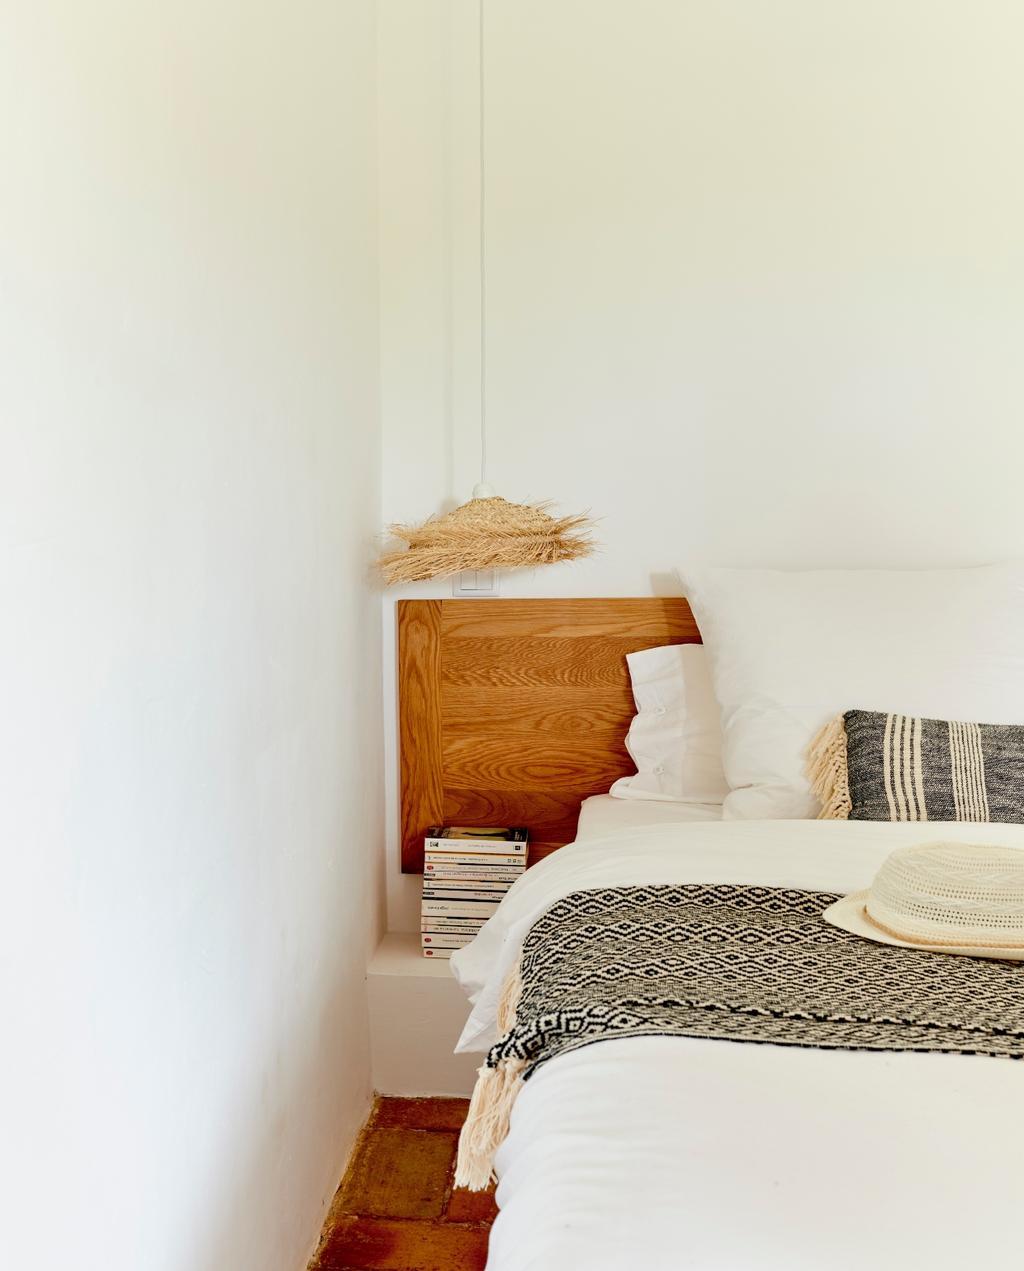 vtwonen 08-2020 | bk buitenland portugal slaapkamer bed met houten frame